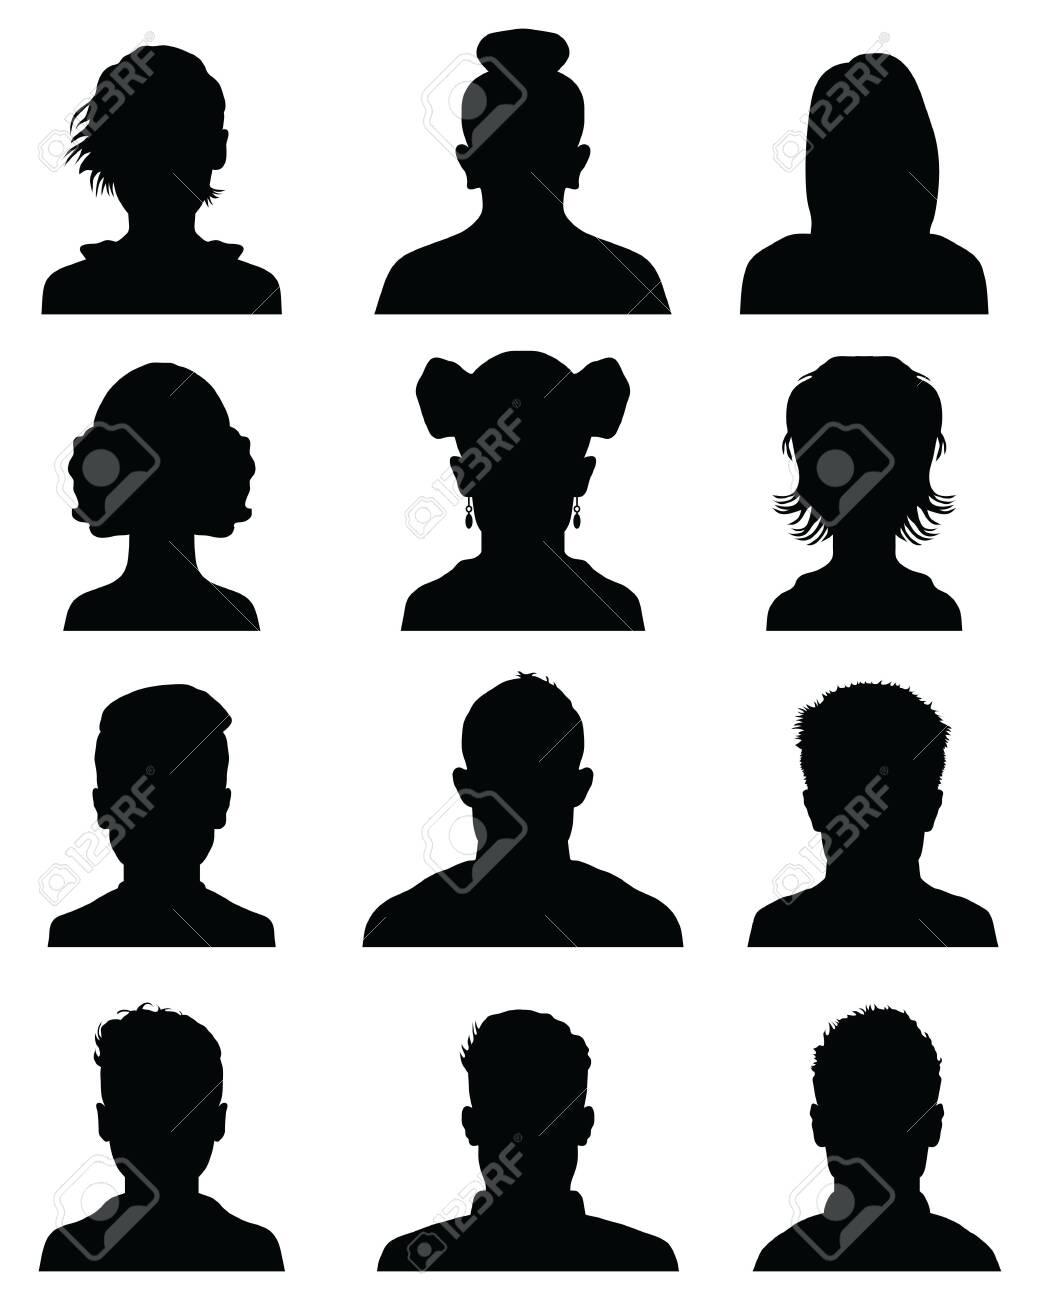 Male and female head silhouettes avatar, profile icons - 121001846